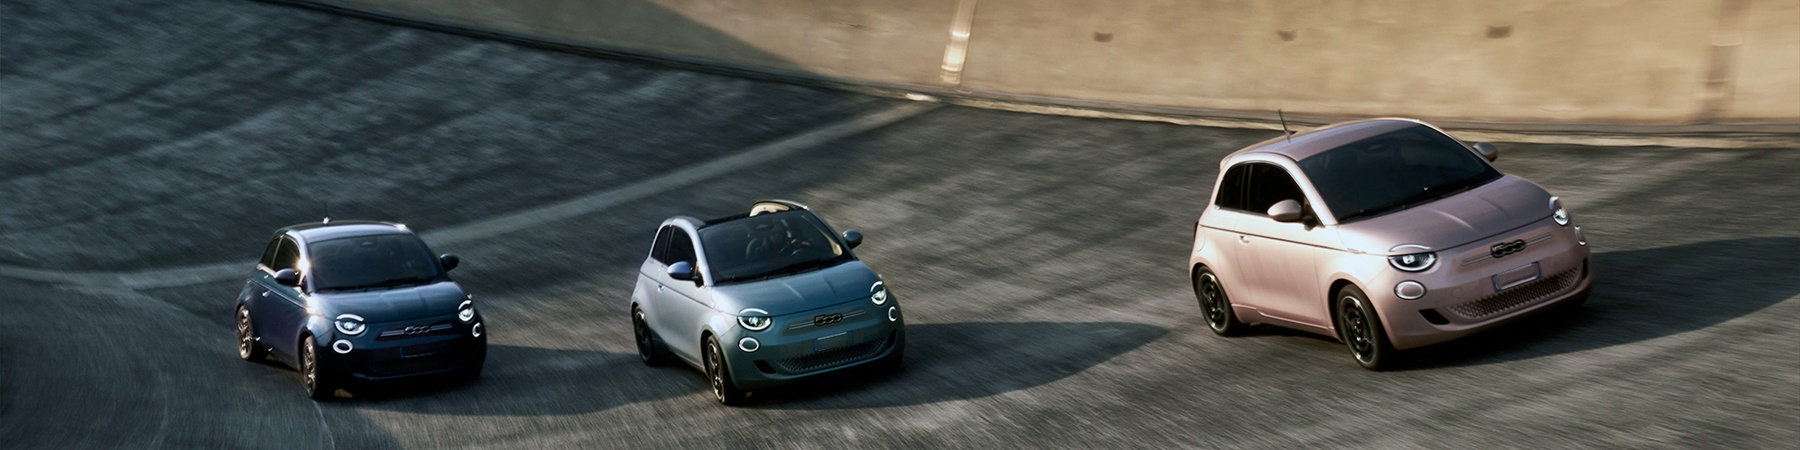 Fiat 500E 3+1 42kWh 266 km actieradius